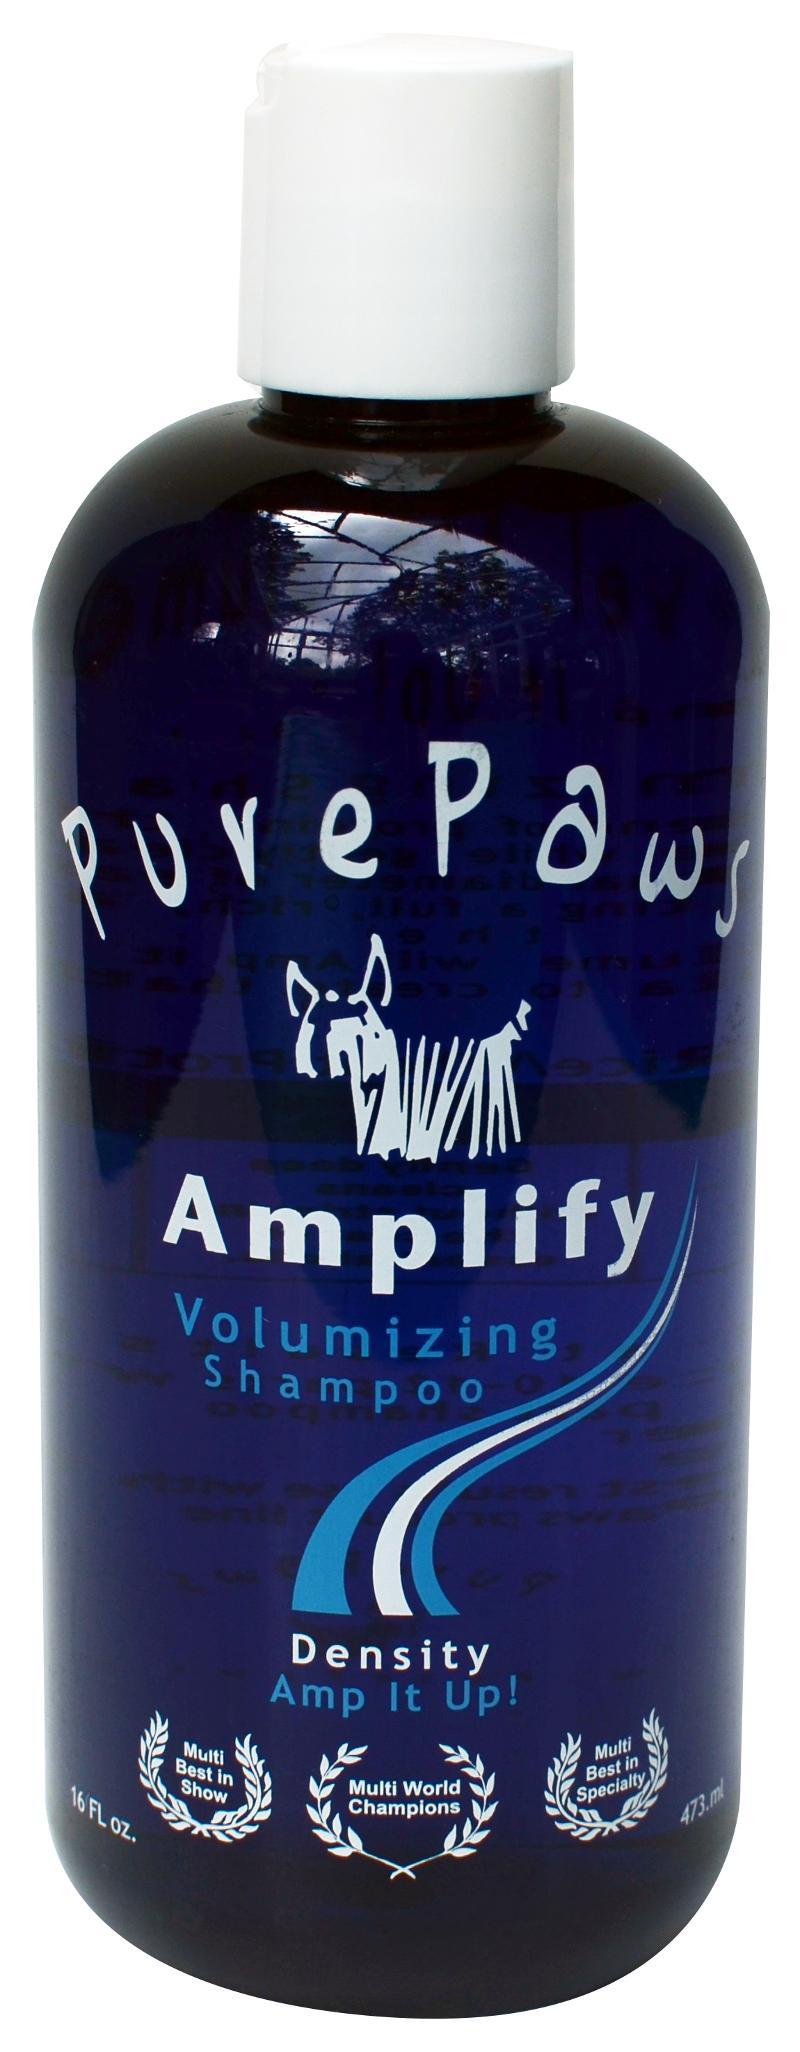 Amplify Volumizing Shampoo